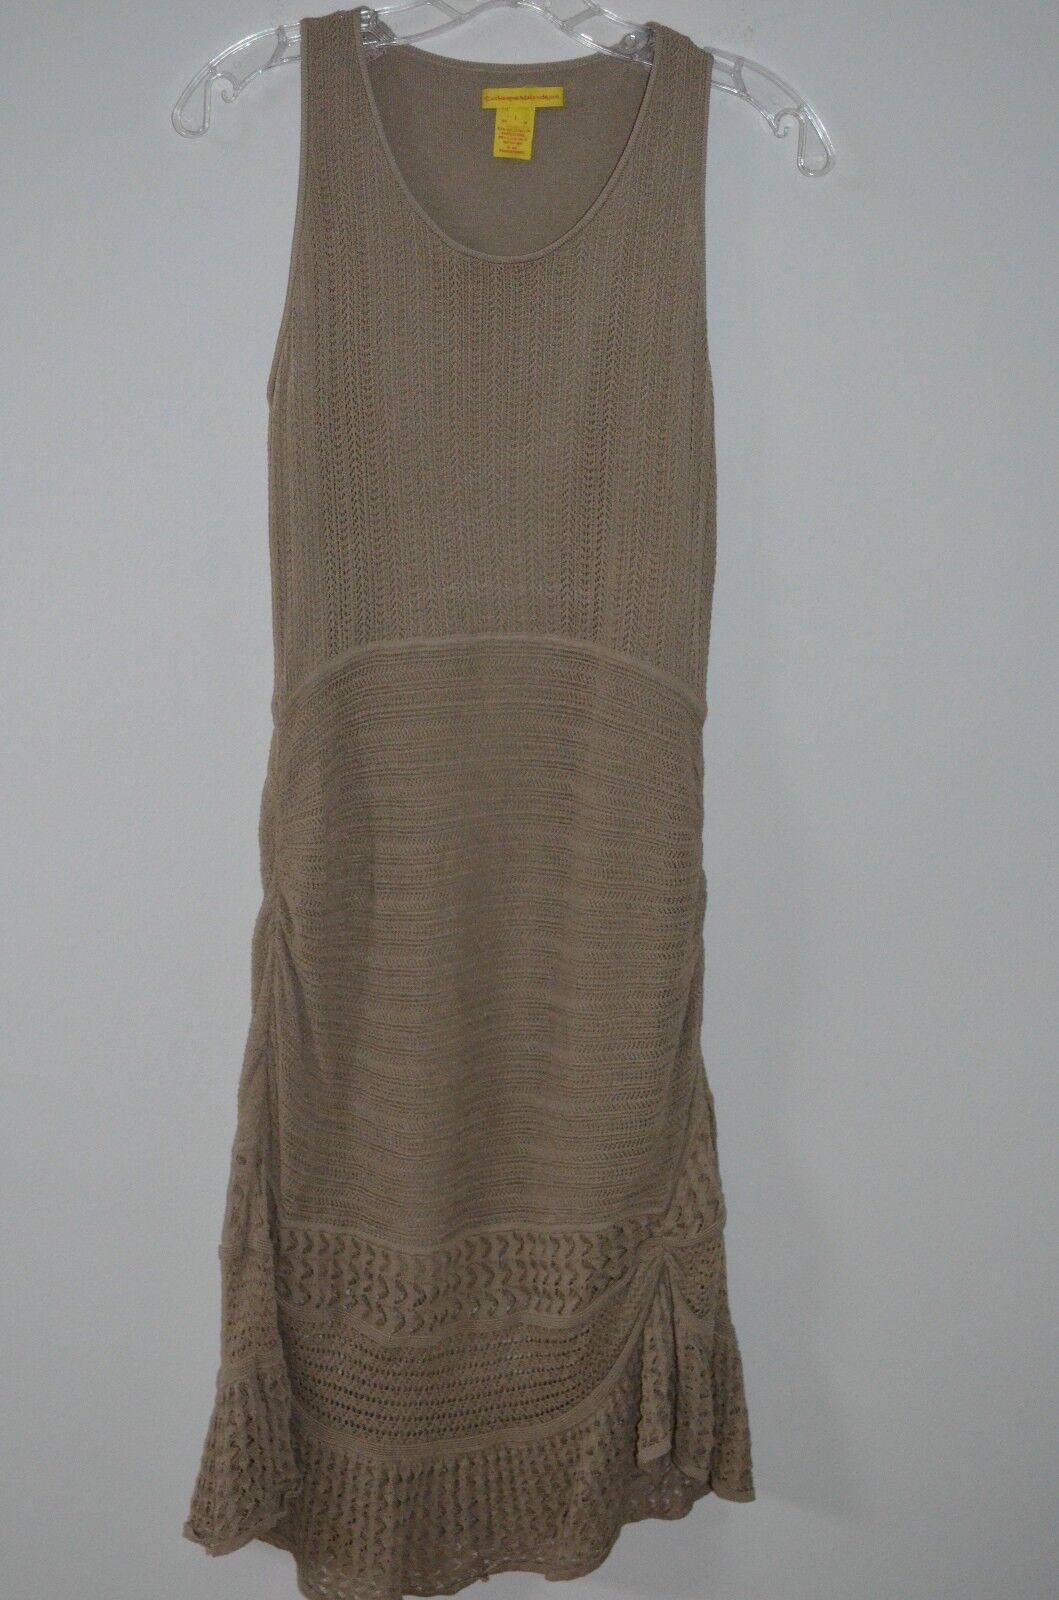 Catherine Malandrino Beige Crocheted 63% Viscose Sleeveless Ruched Dress Size L